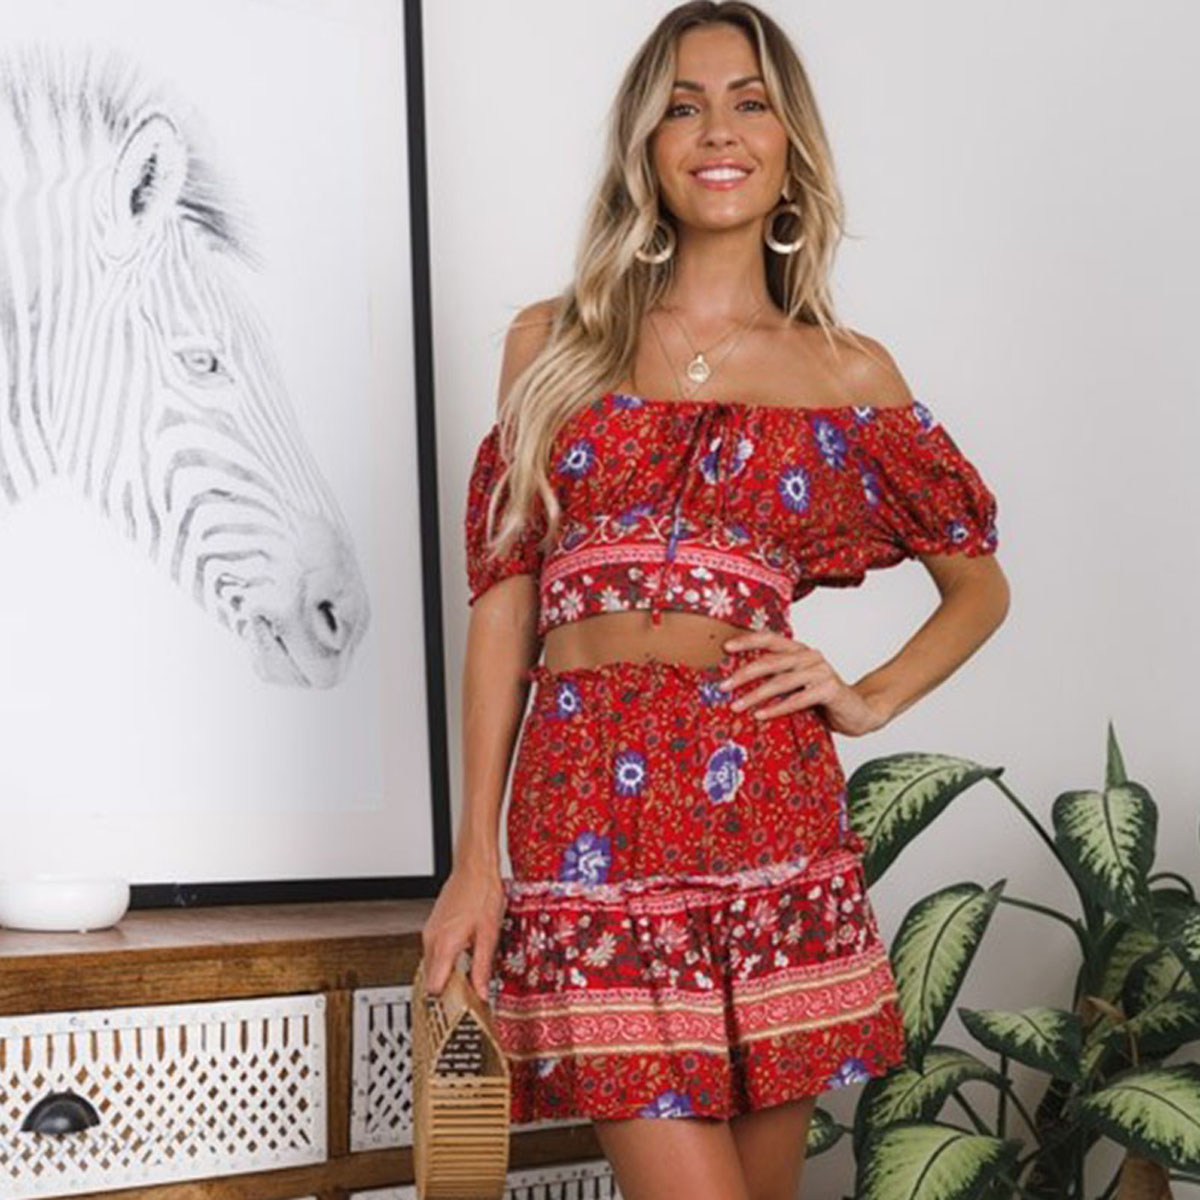 c9fa0962e1 Jastie Floral Print 2 Piece Set Women Dress Summer Short Sleeve Crop Top + Mini  Skirt Boho Dresses Set Casual Beach Dress Suit-in Women's Sets from Women's  ...